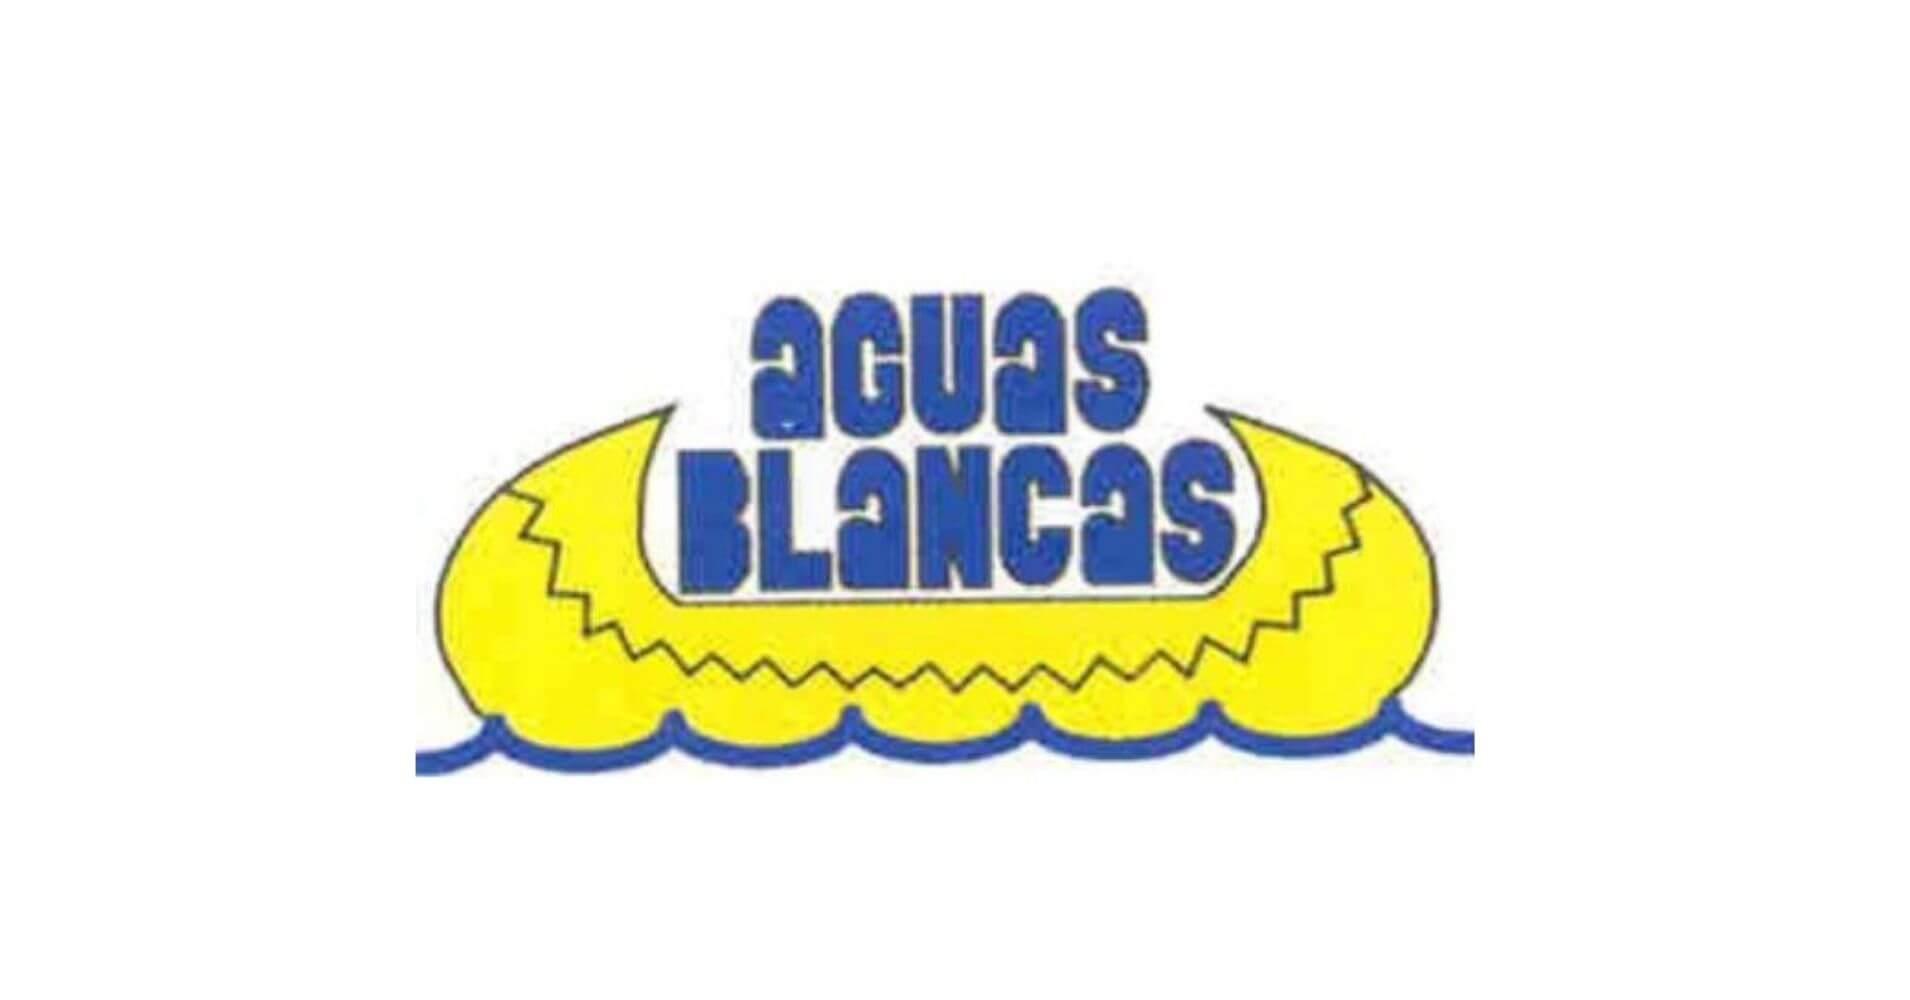 Logotipo de Aguas Blancas.